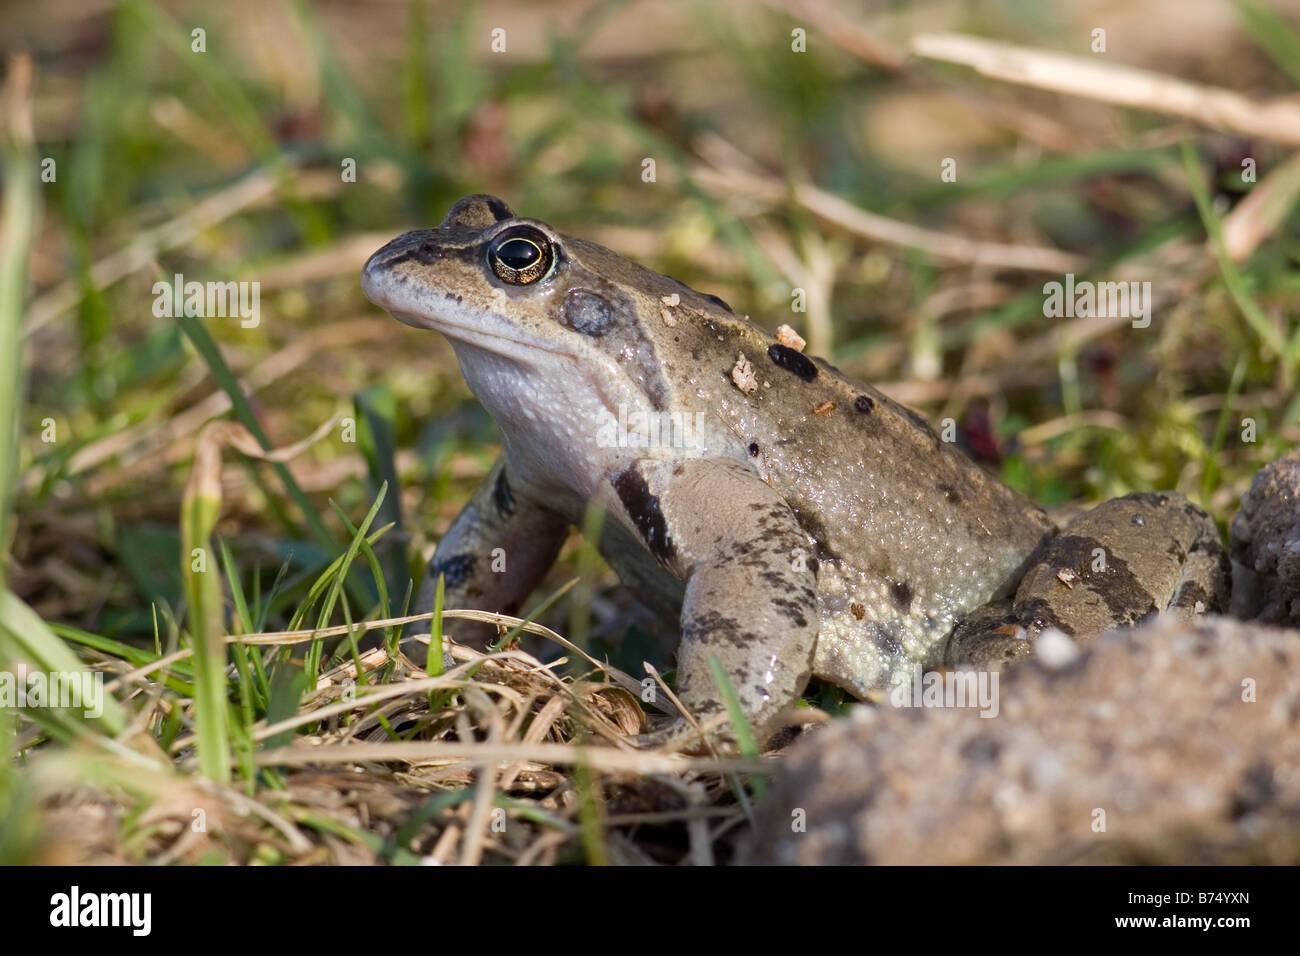 Common Frog, Rana temporaria in grass - Stock Image